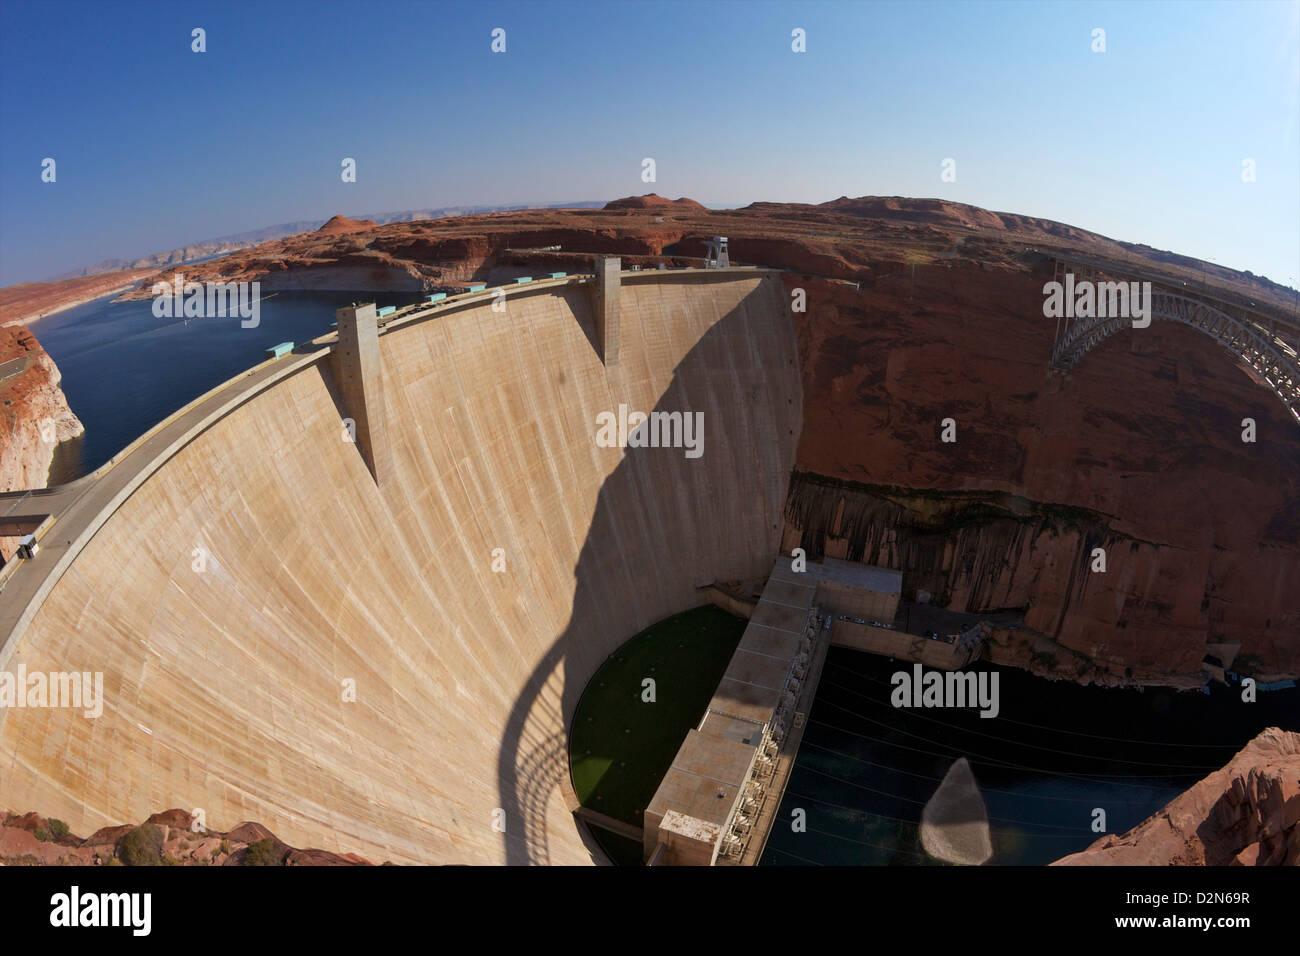 Glen Canyon Dam across the Colorado River, Arizona, United States of America, North America Stock Photo